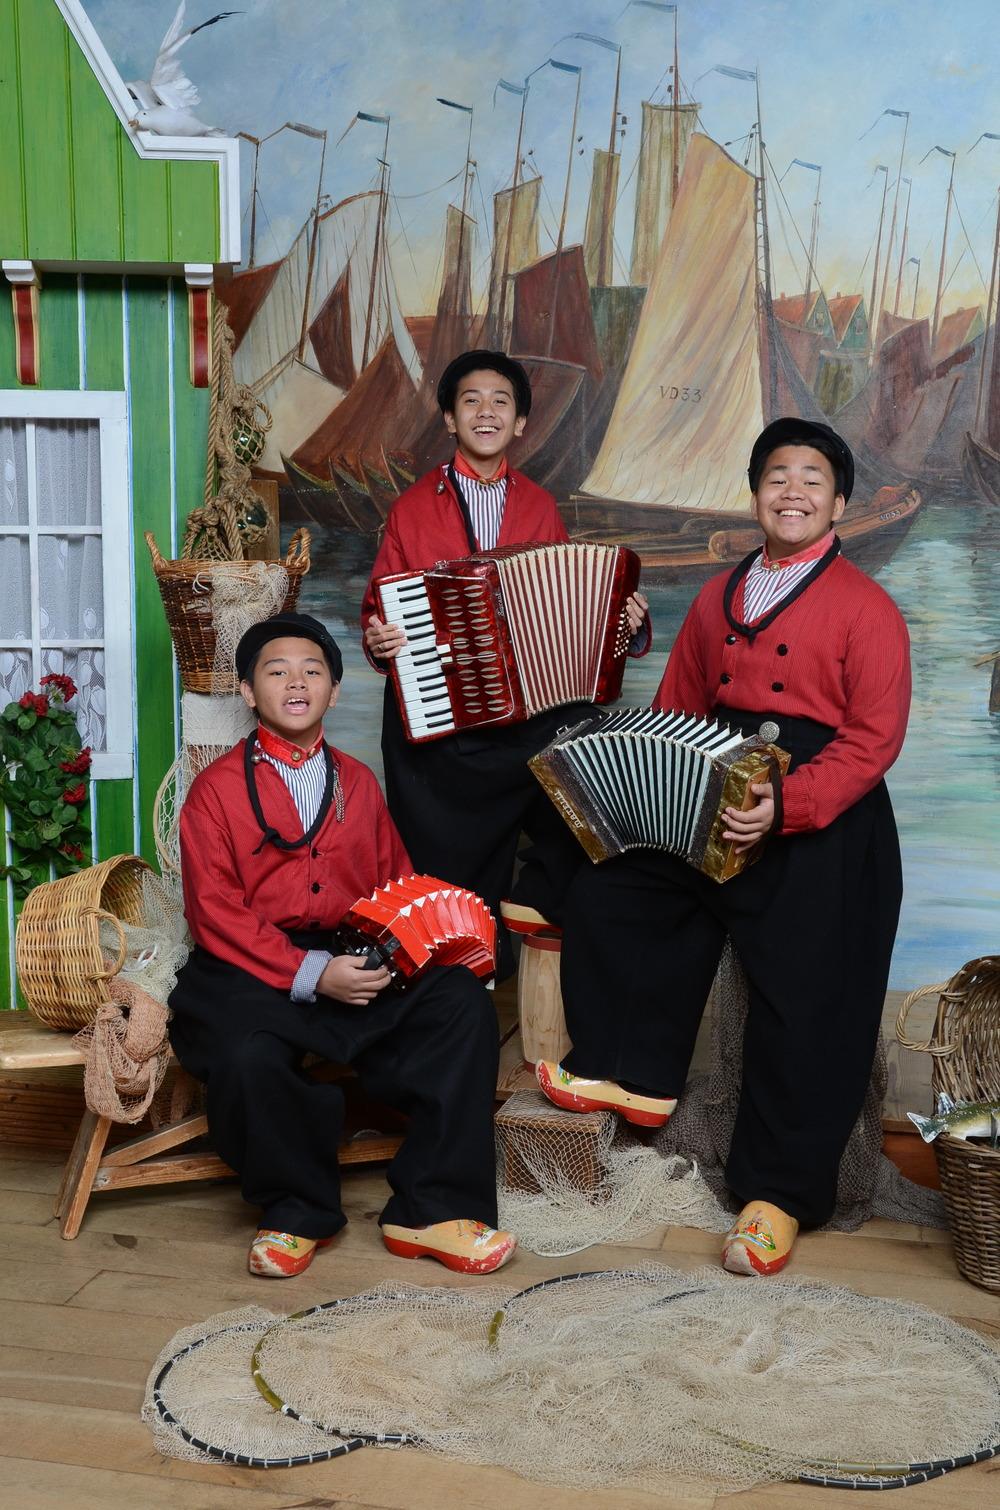 DSC_1798boy band indo.JPG